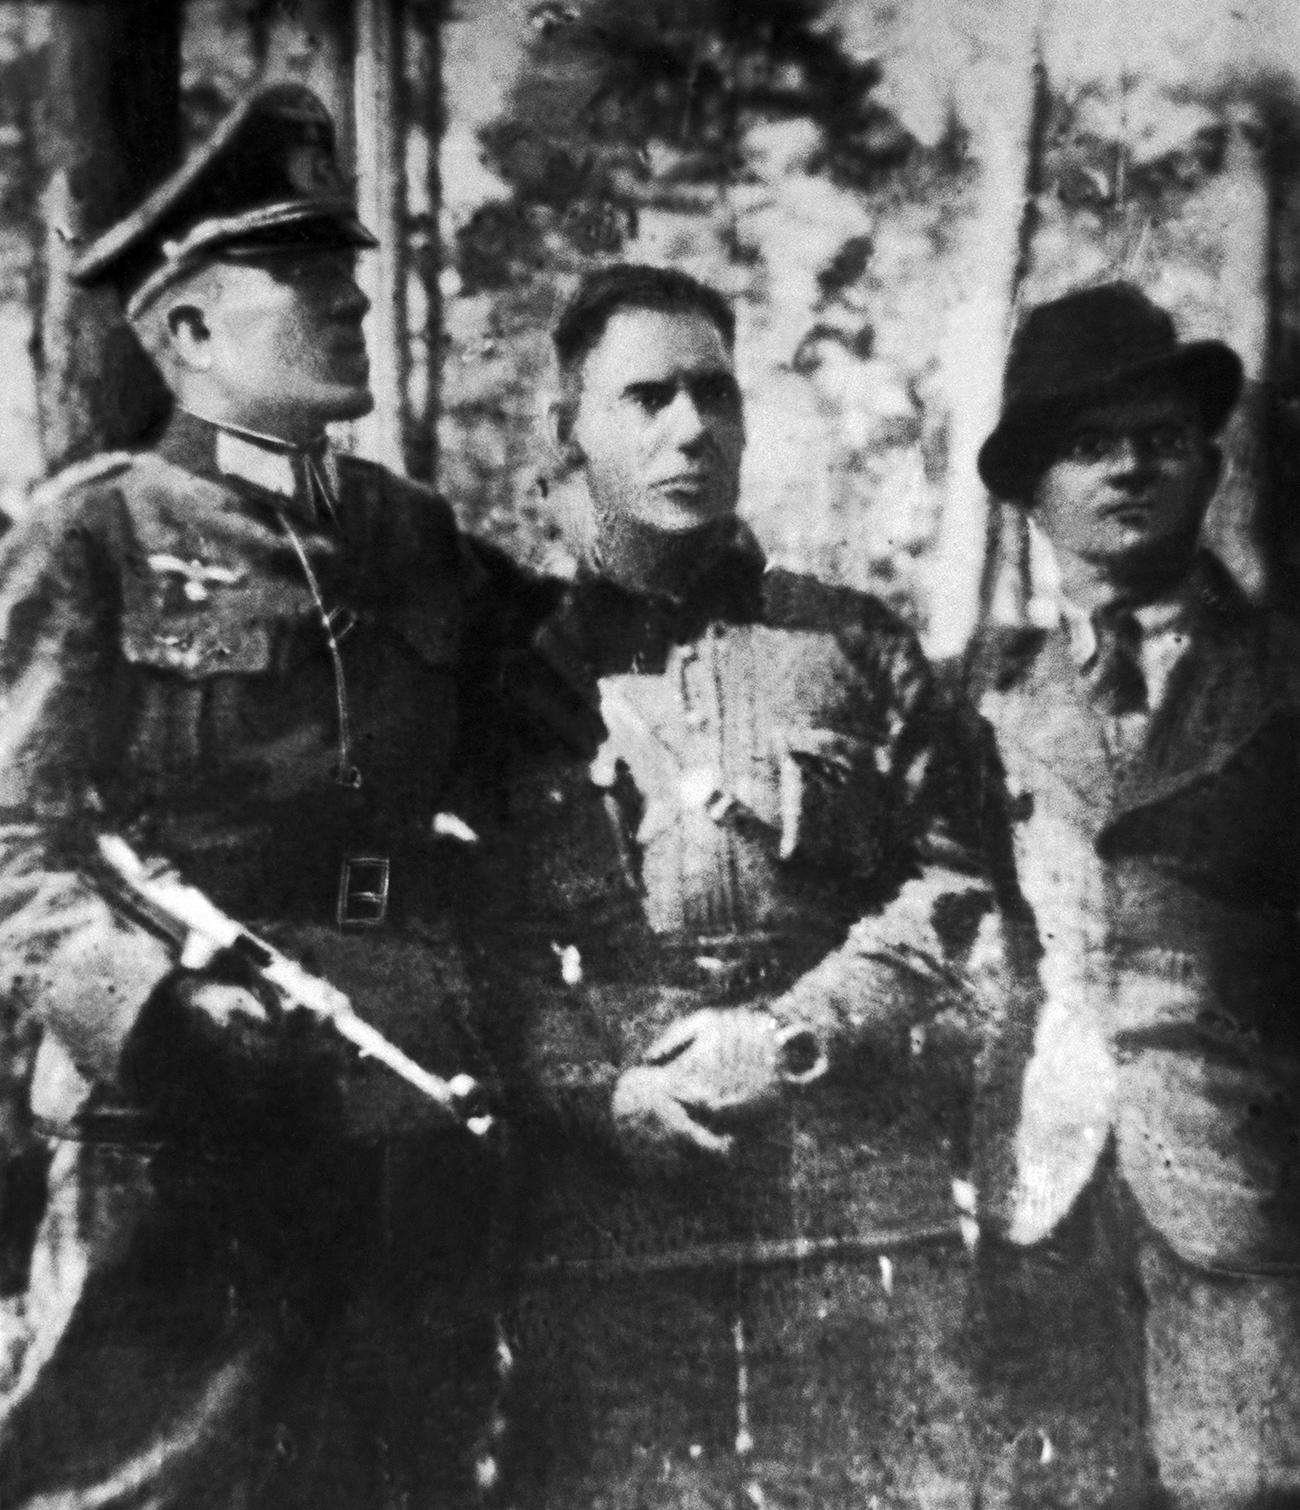 Нниколај Кузнецов во нацистична униформа / Пјотр Здоровило/ ТАСС